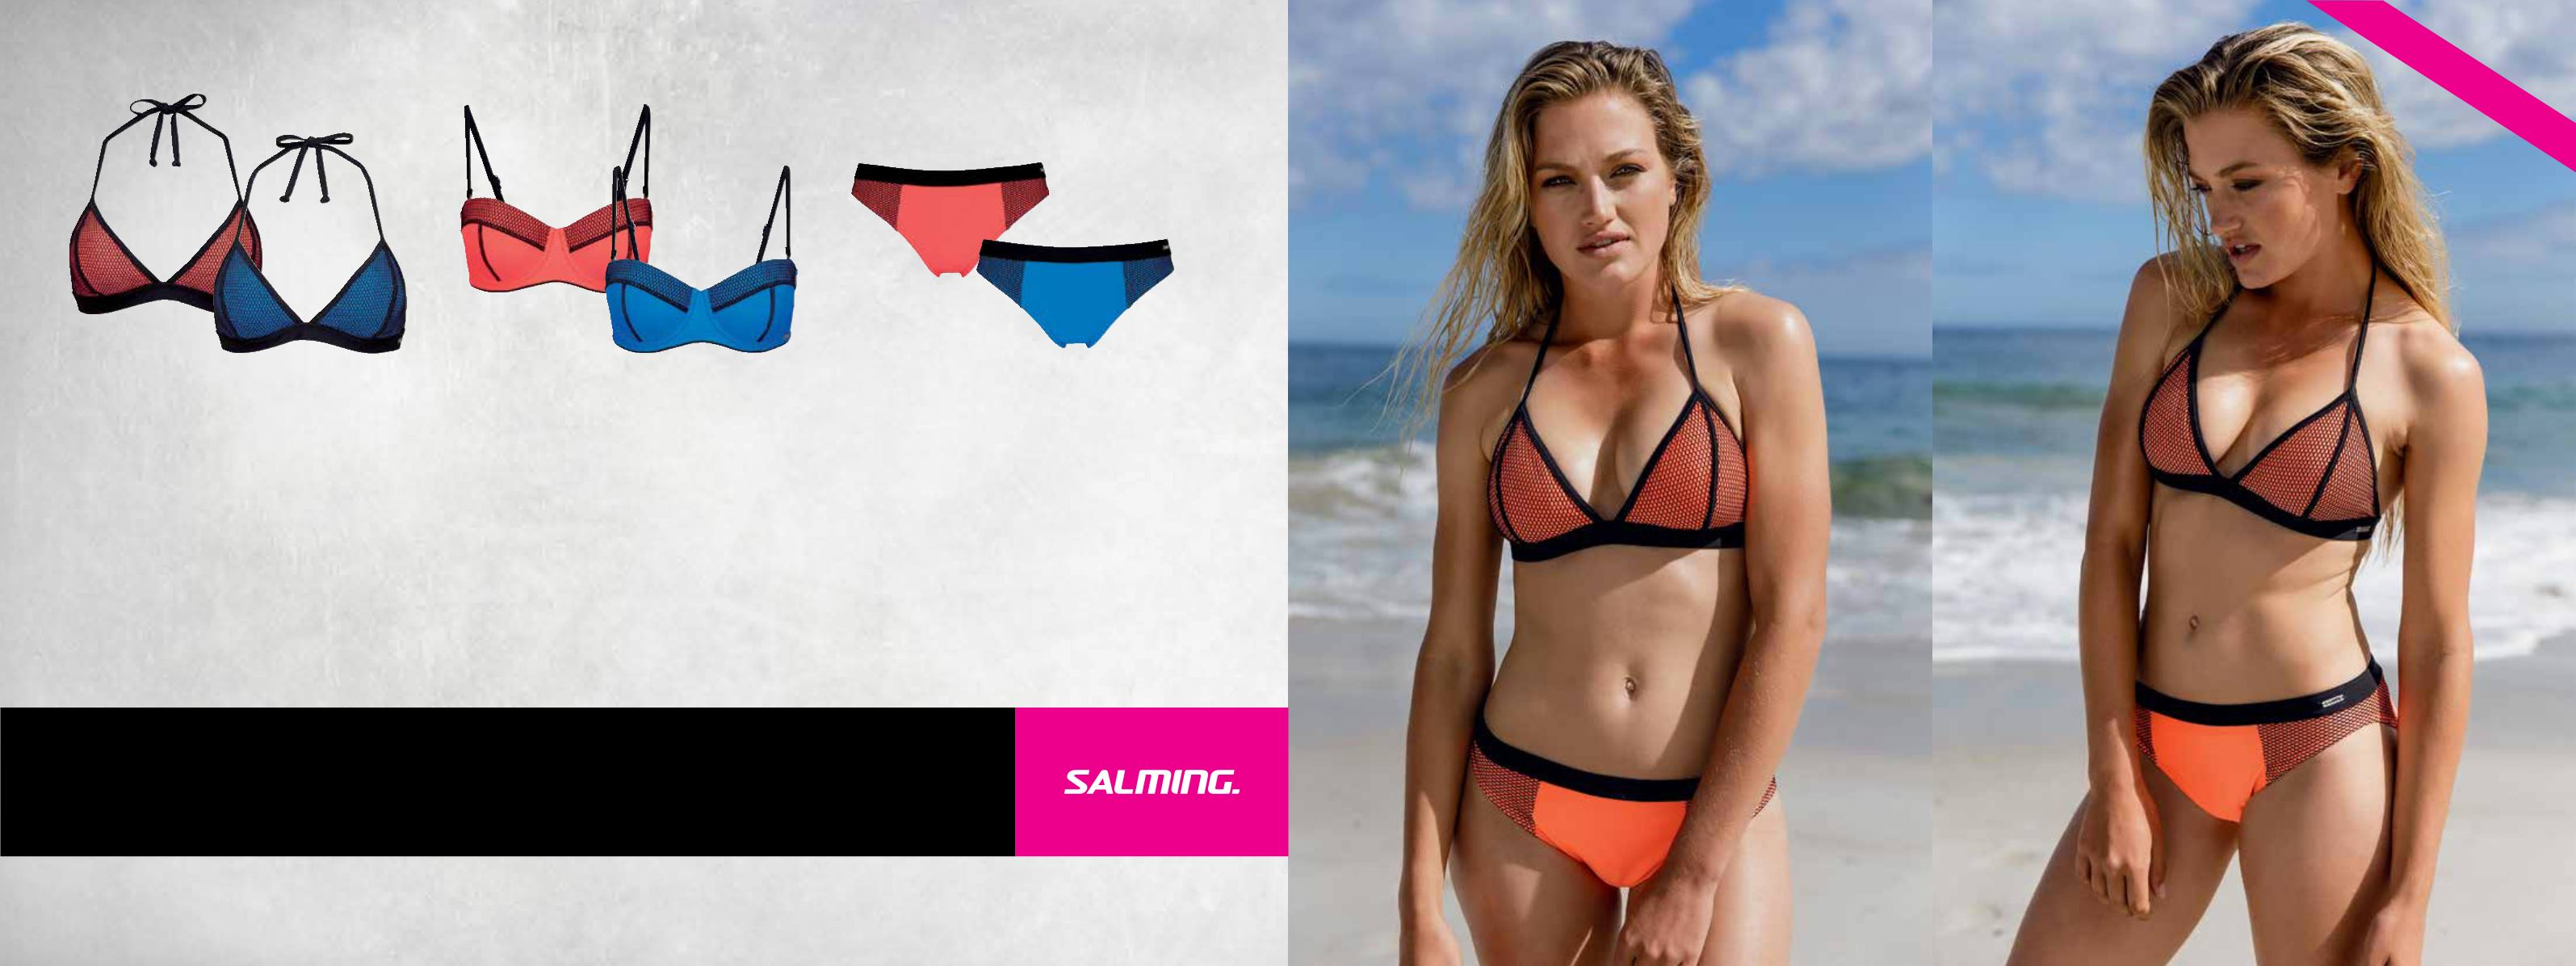 Salming Underwear Collection 2015 - page 48-49 00853bdf2d31c